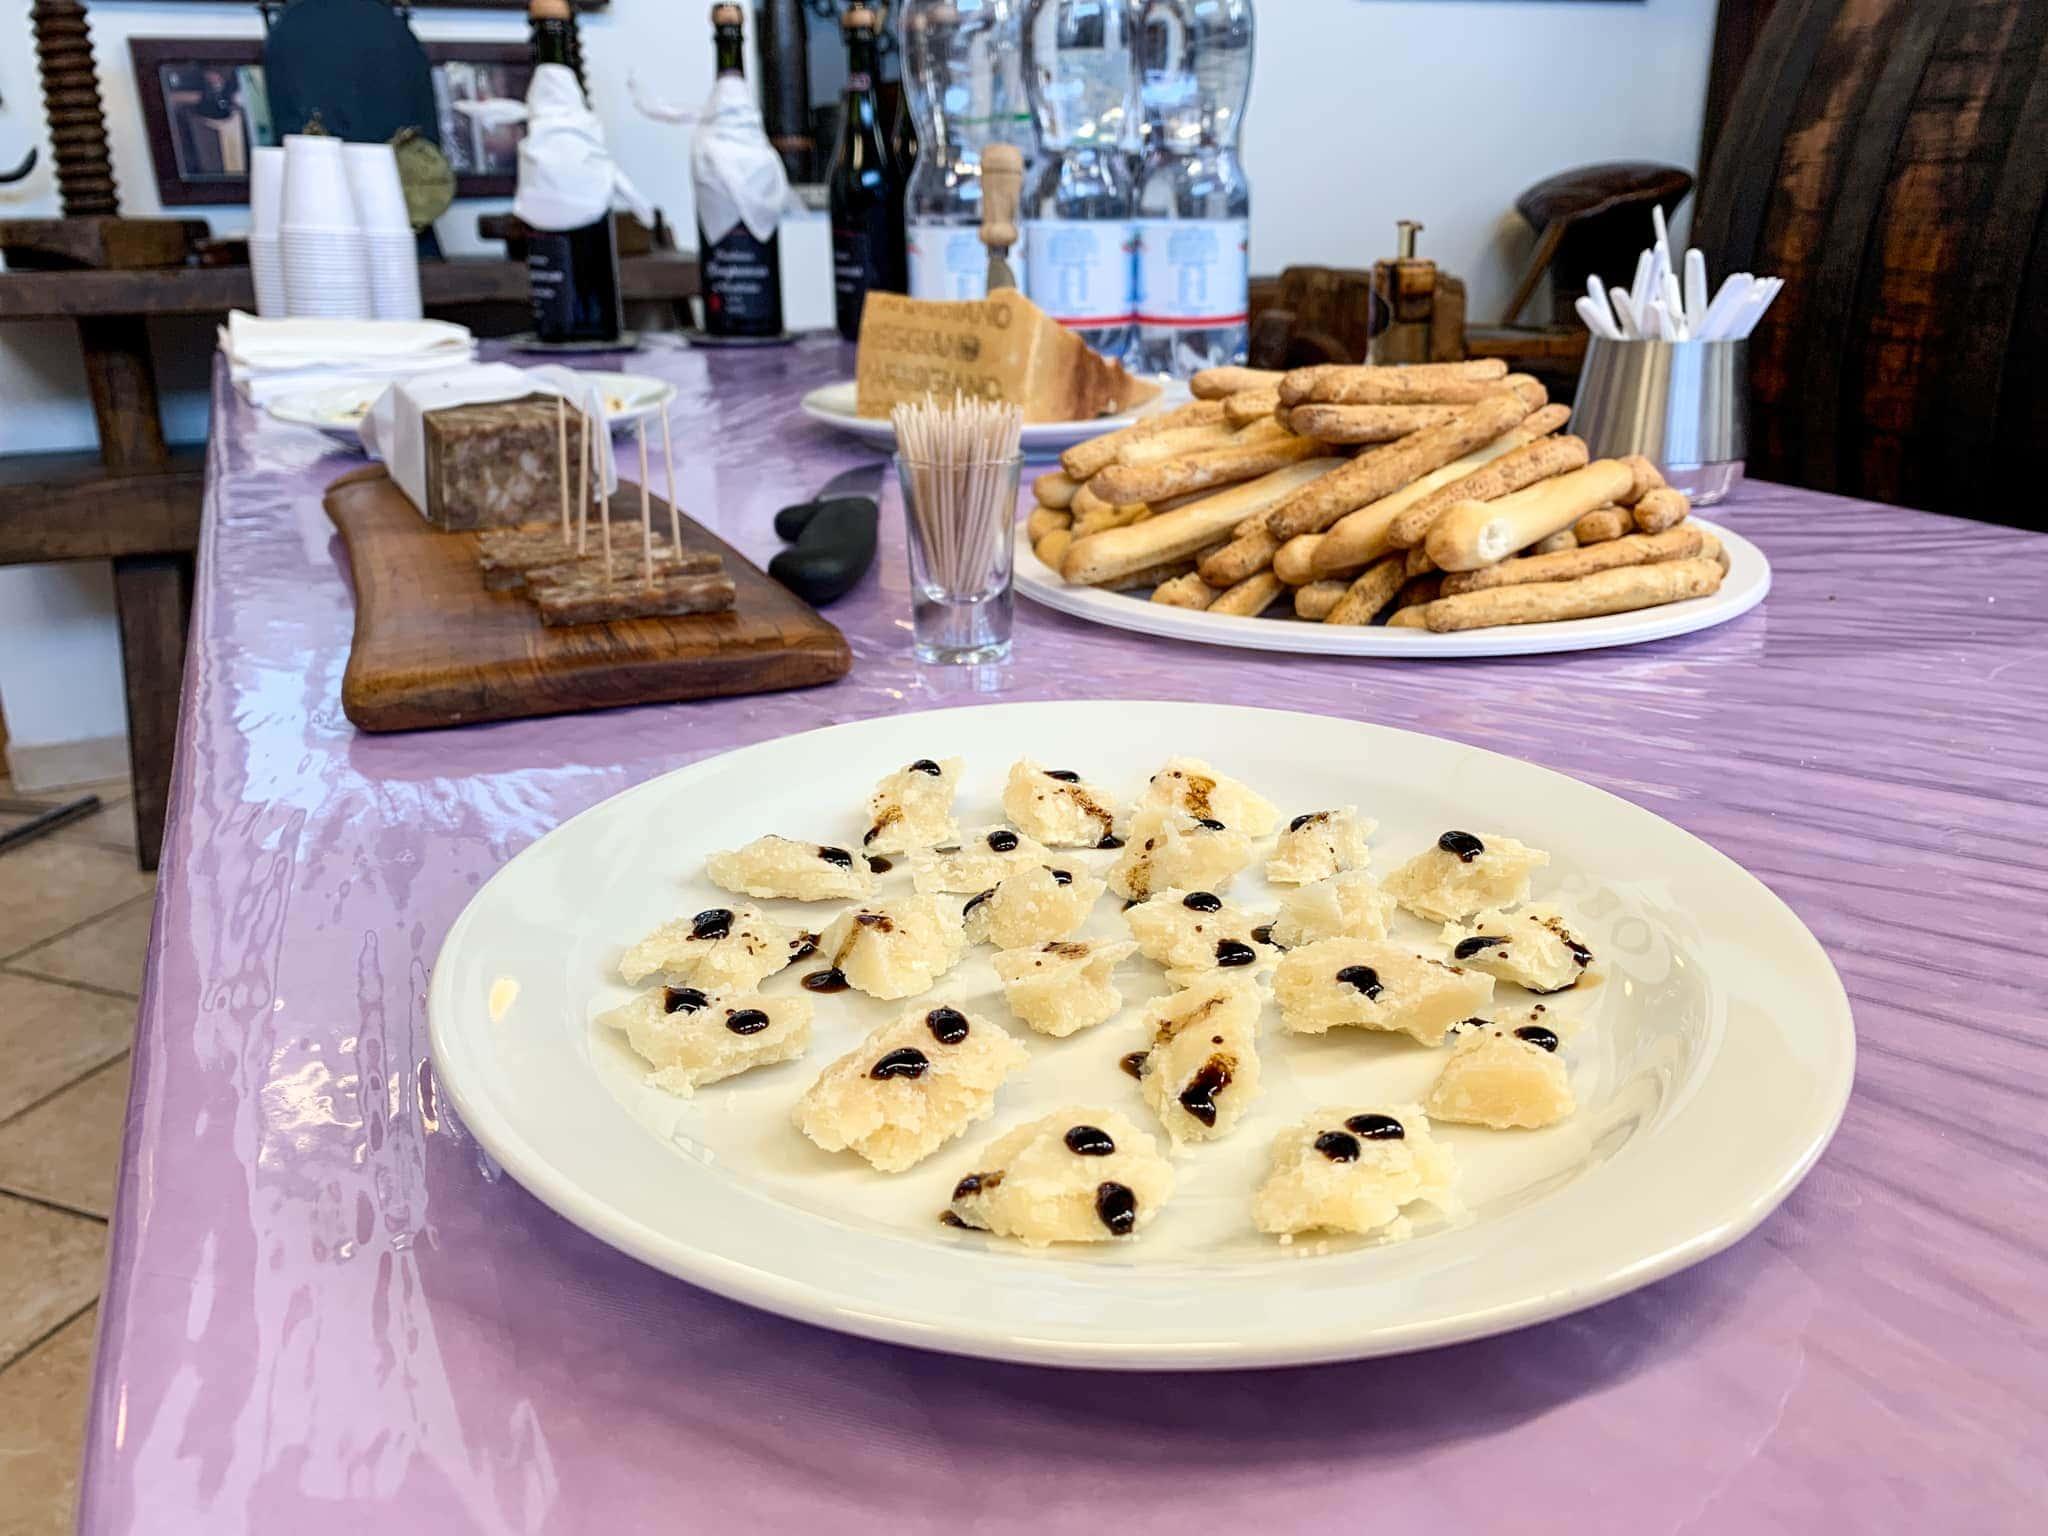 Balsamic and Parmigiano Reggiano